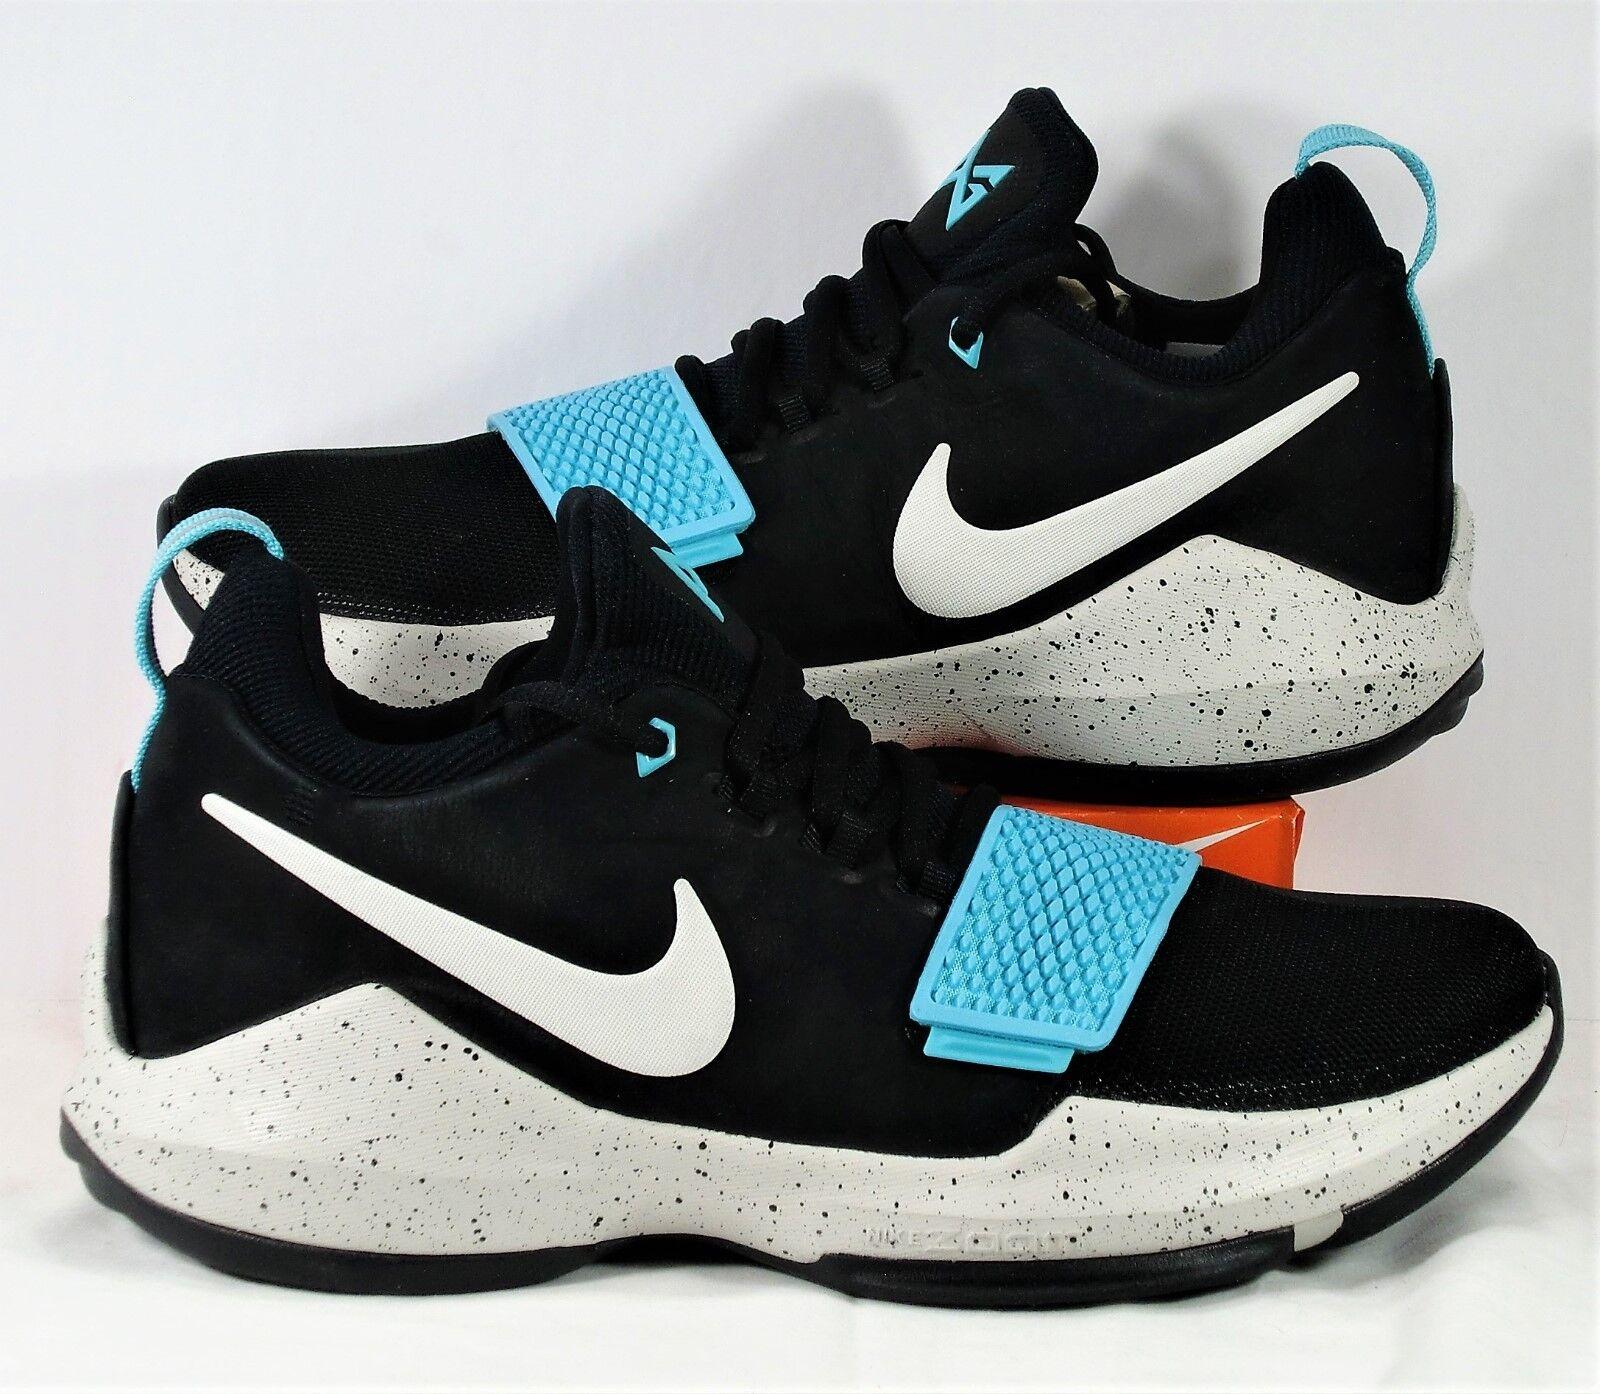 Nike PG 1 Paul George Negro Aqua & Light Bone & Aqua Negro Basketball SZ 9.5 nueva 2156c8